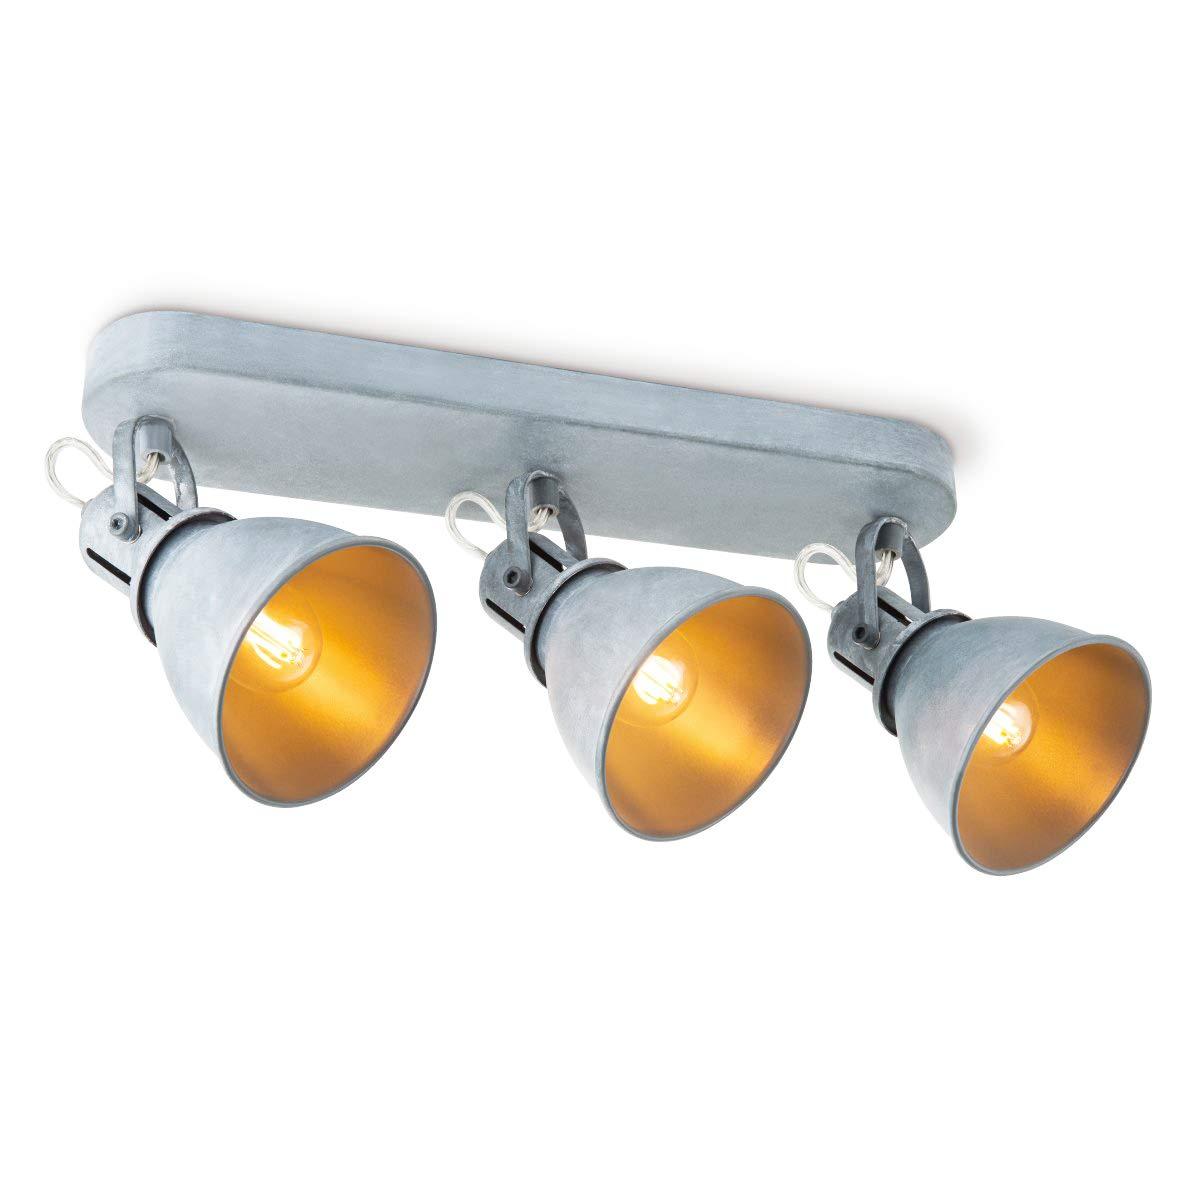 Deckenspot LED 3-flammig Industrial Drehbar und Schwenkbar 3 Spots Inklusive LED E14 Leuchtmittel Warmwei/ß Metall 2700K Verstellbare LED Deckenstrahler Industrielle Beton-Optik Energieklasse A+